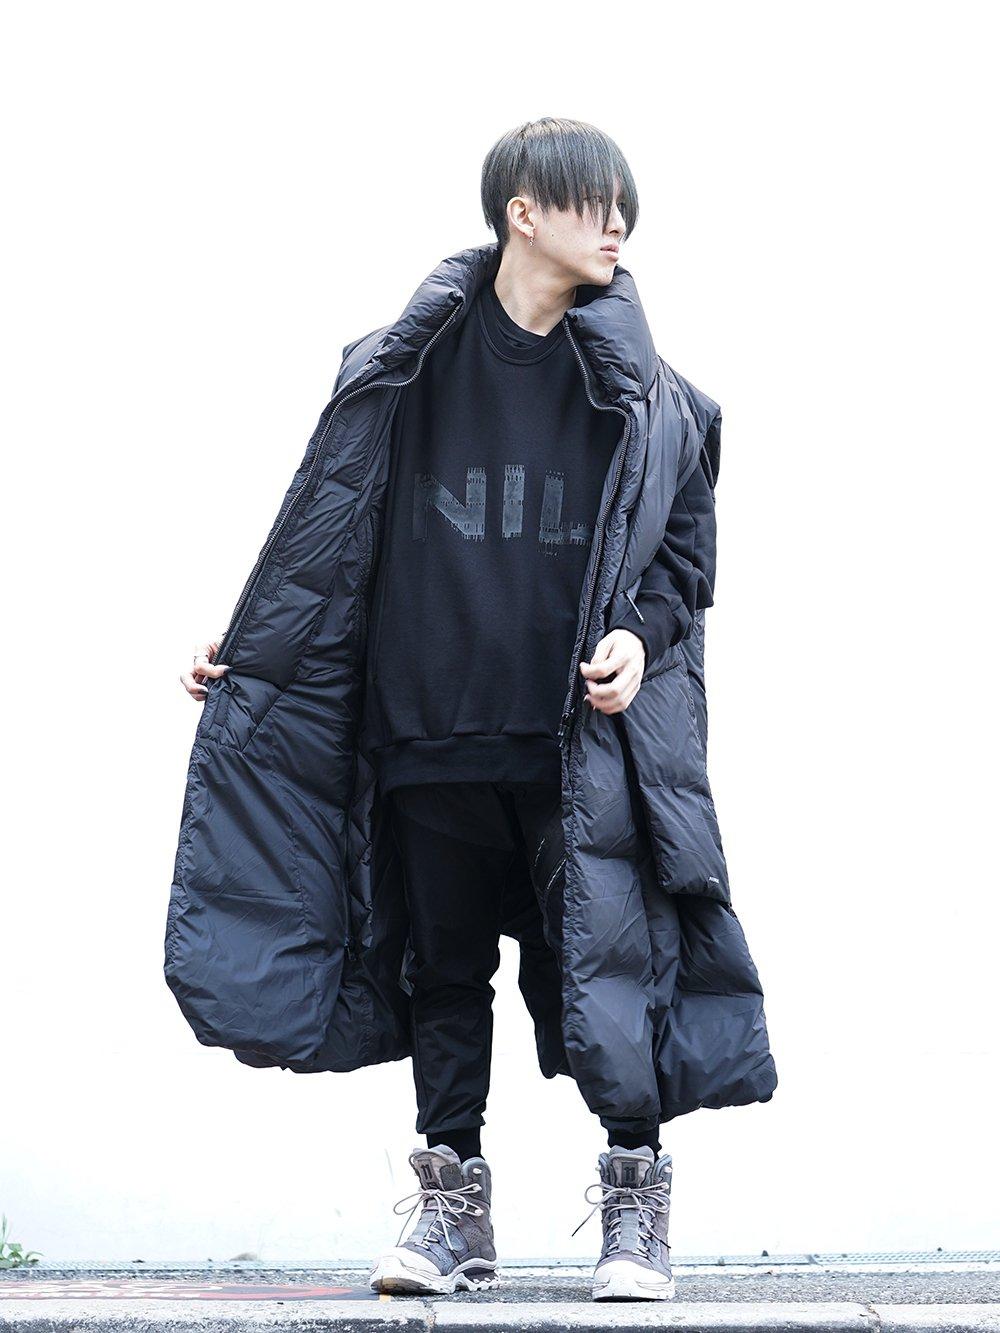 HAMCUS × NILøS 19aw Down long vest Black Styling!! - 4-001